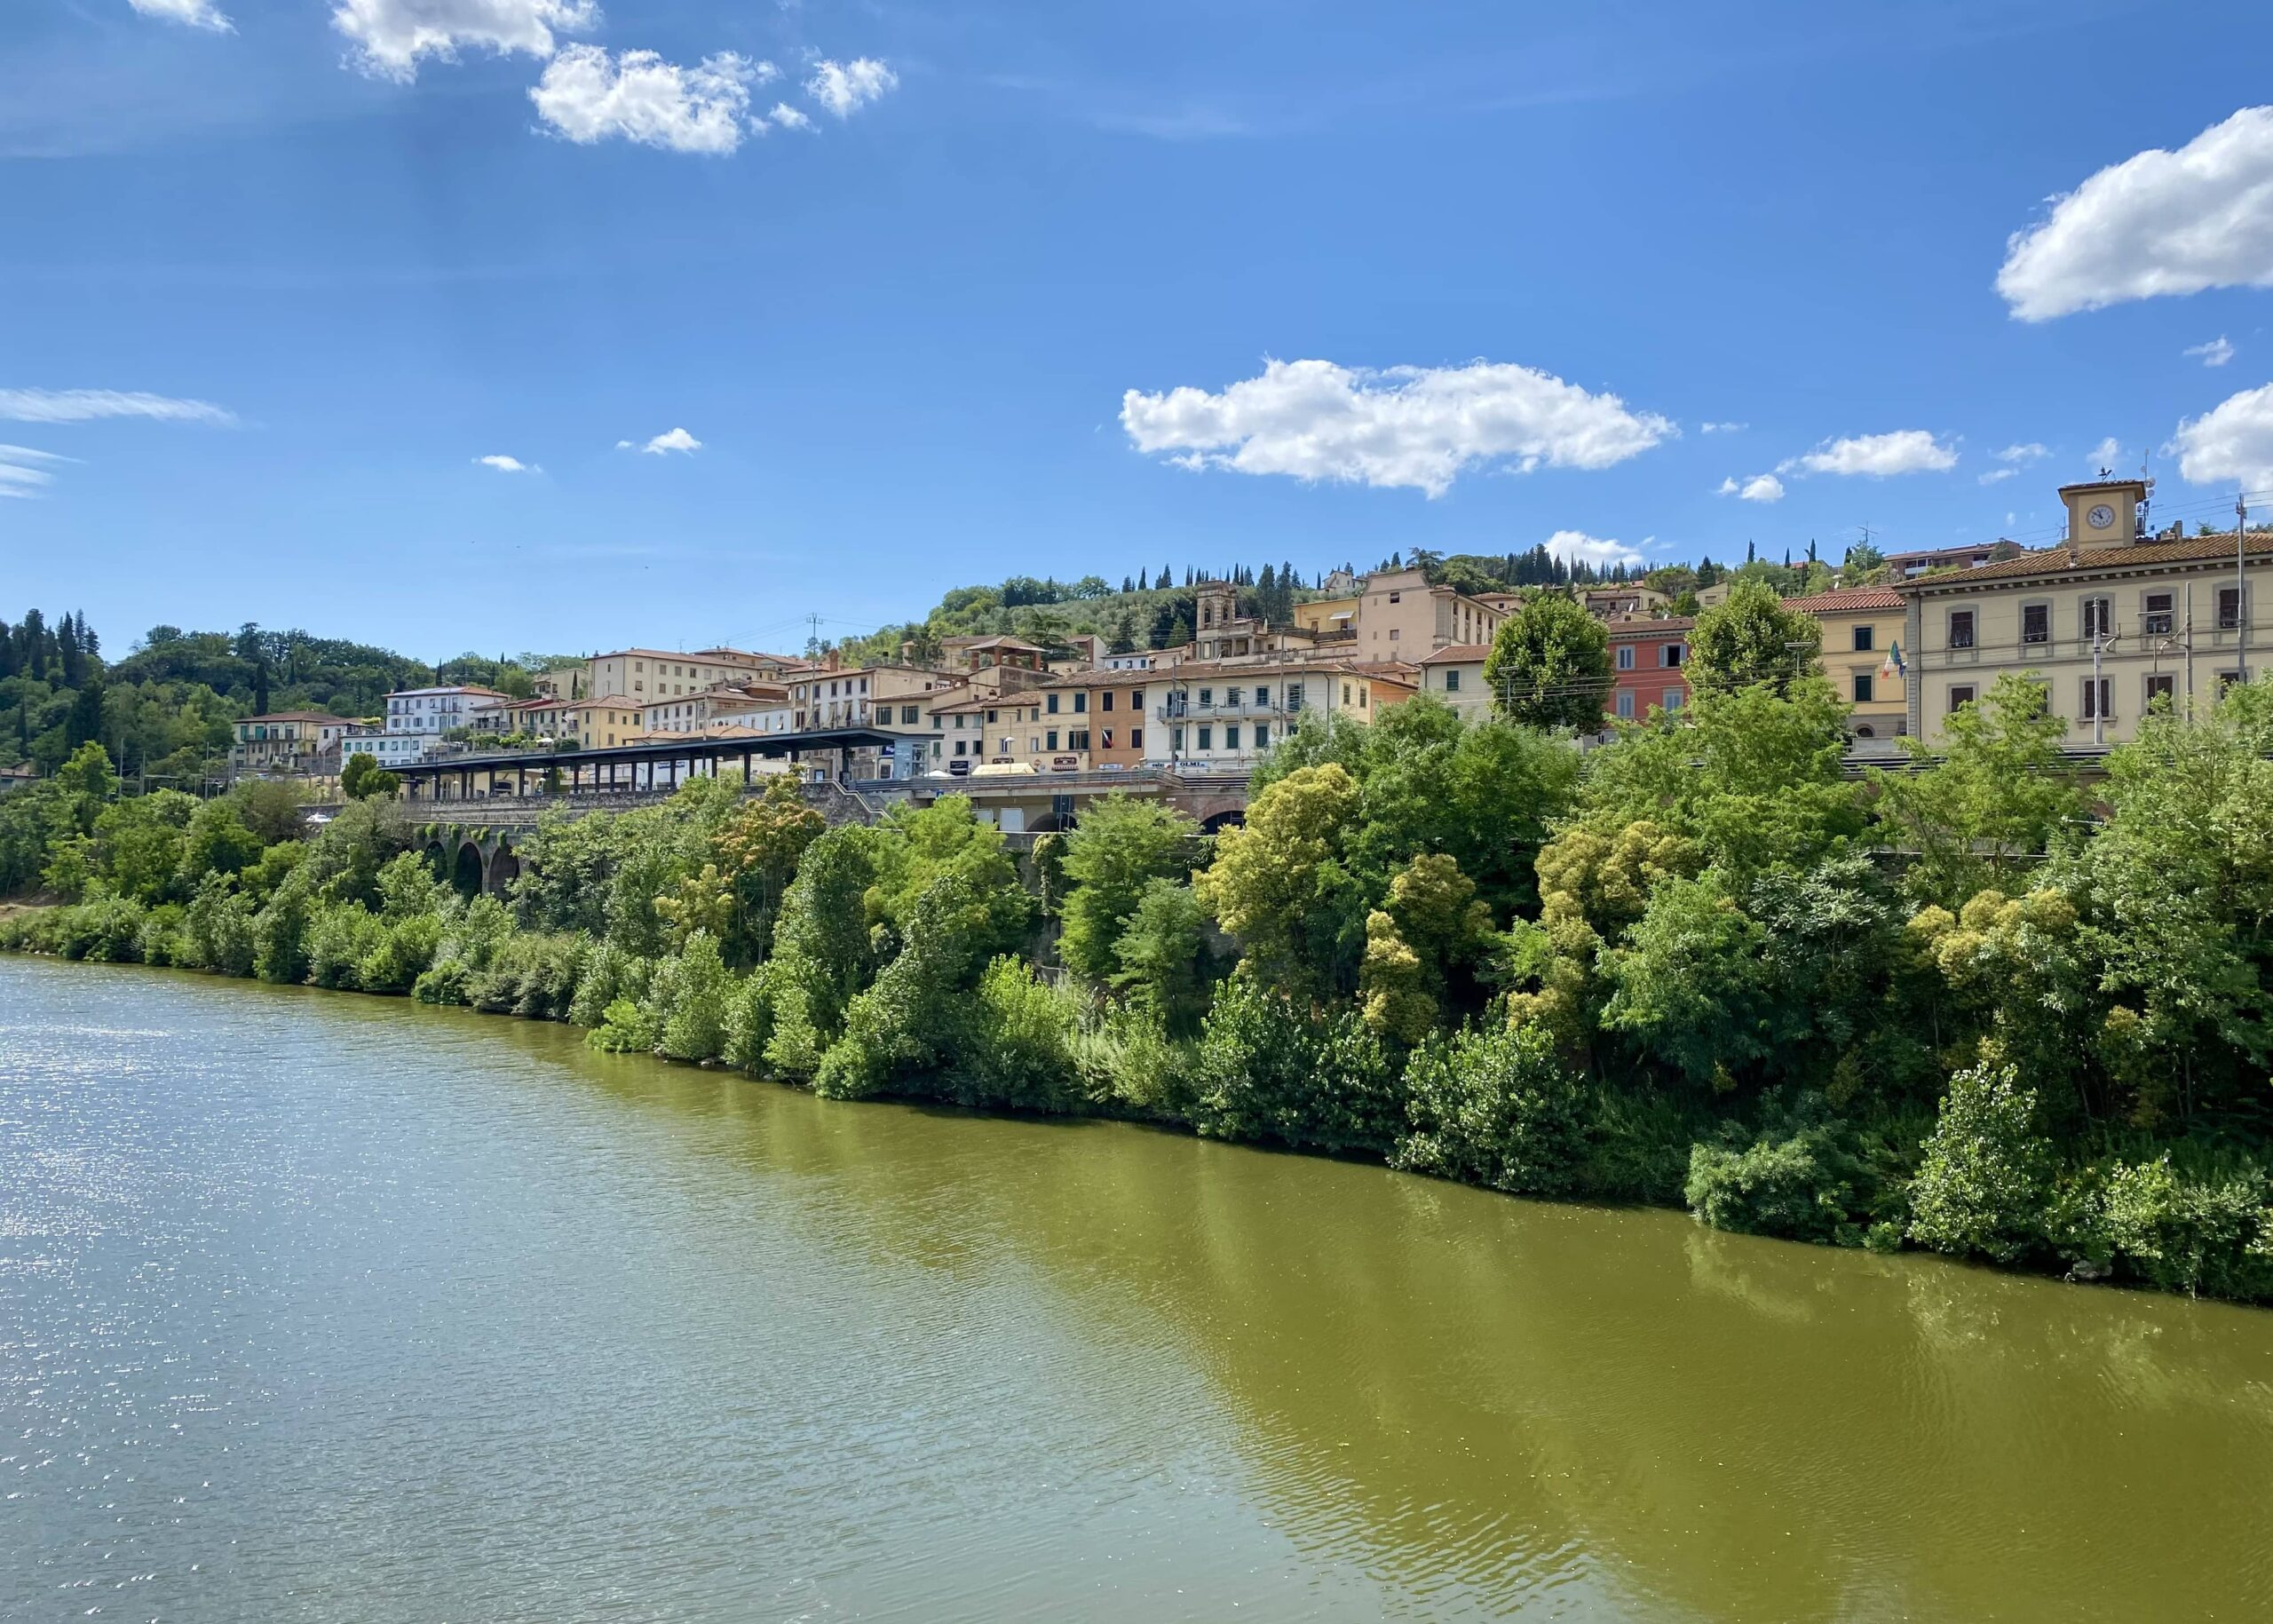 Cycling_Florence_Rignano_sull'Arno